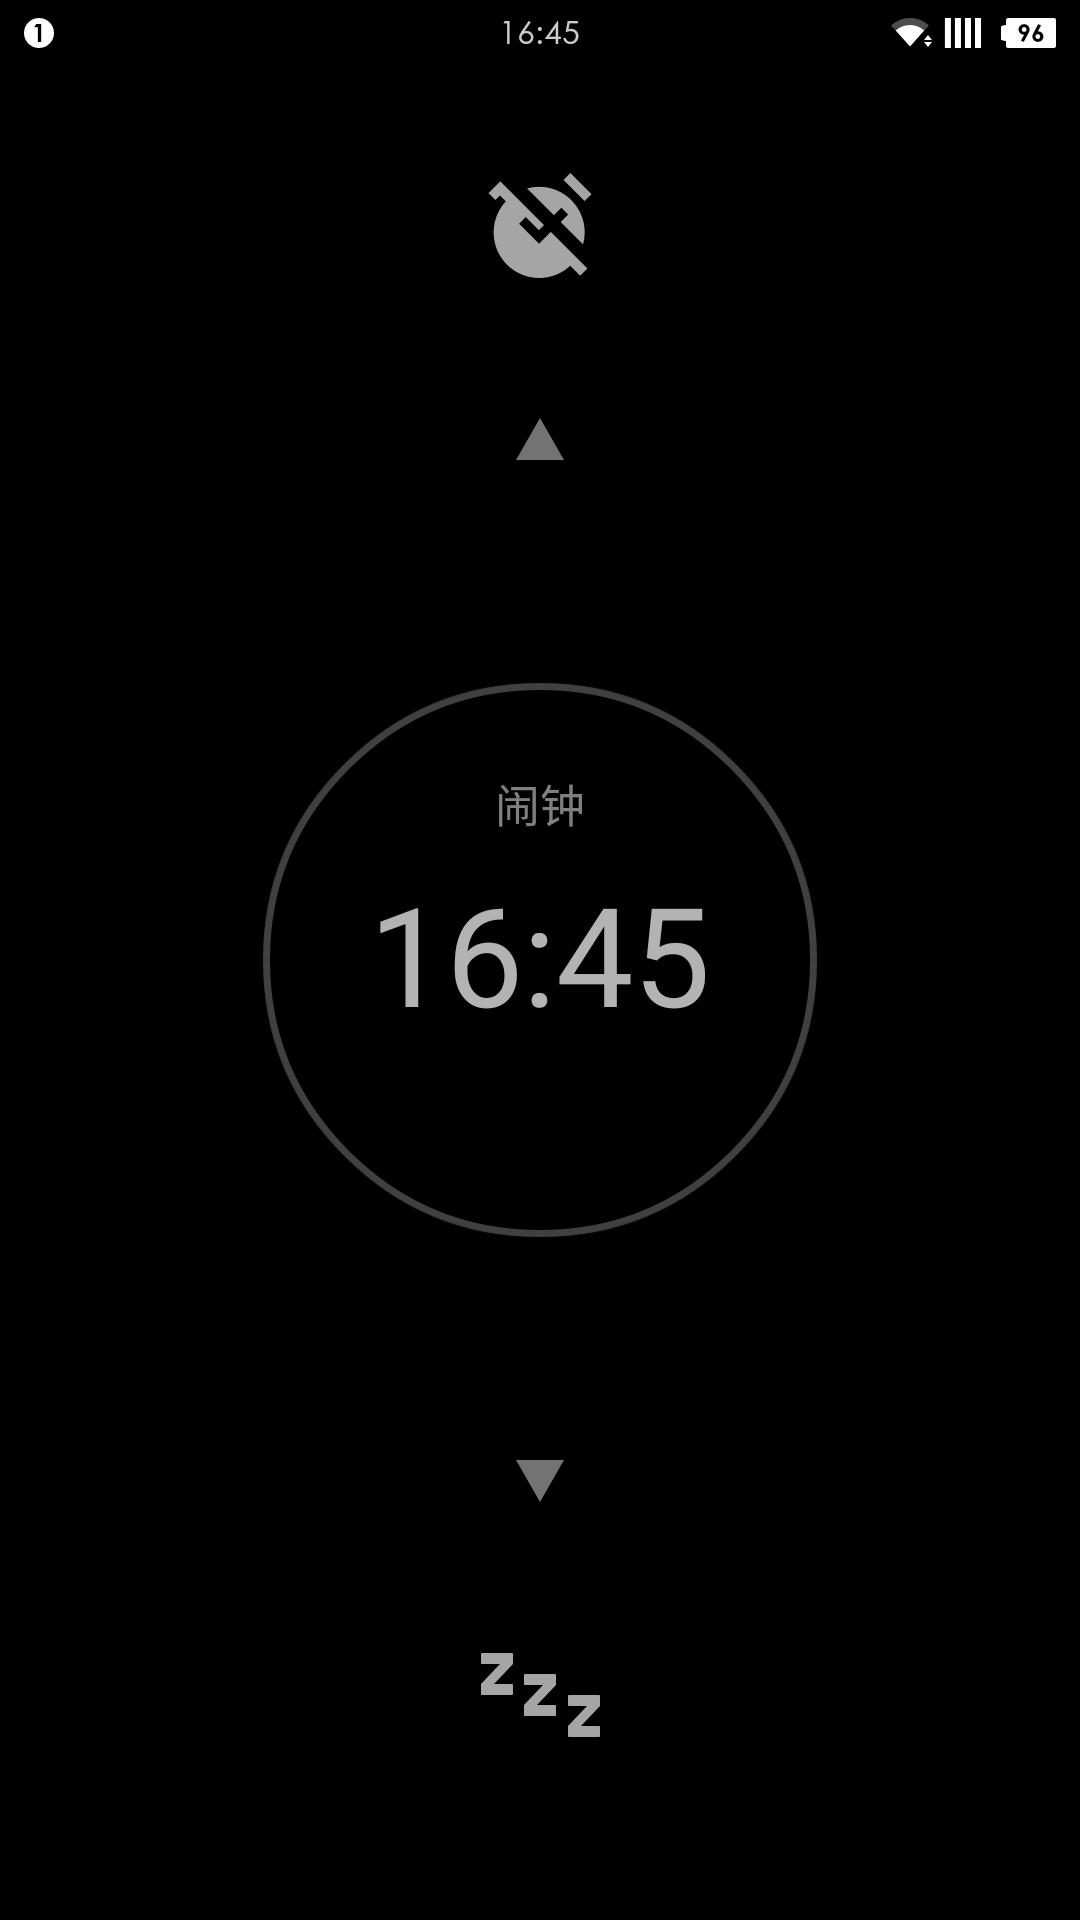 Screenshot_2015-12-16-16-45-09.png